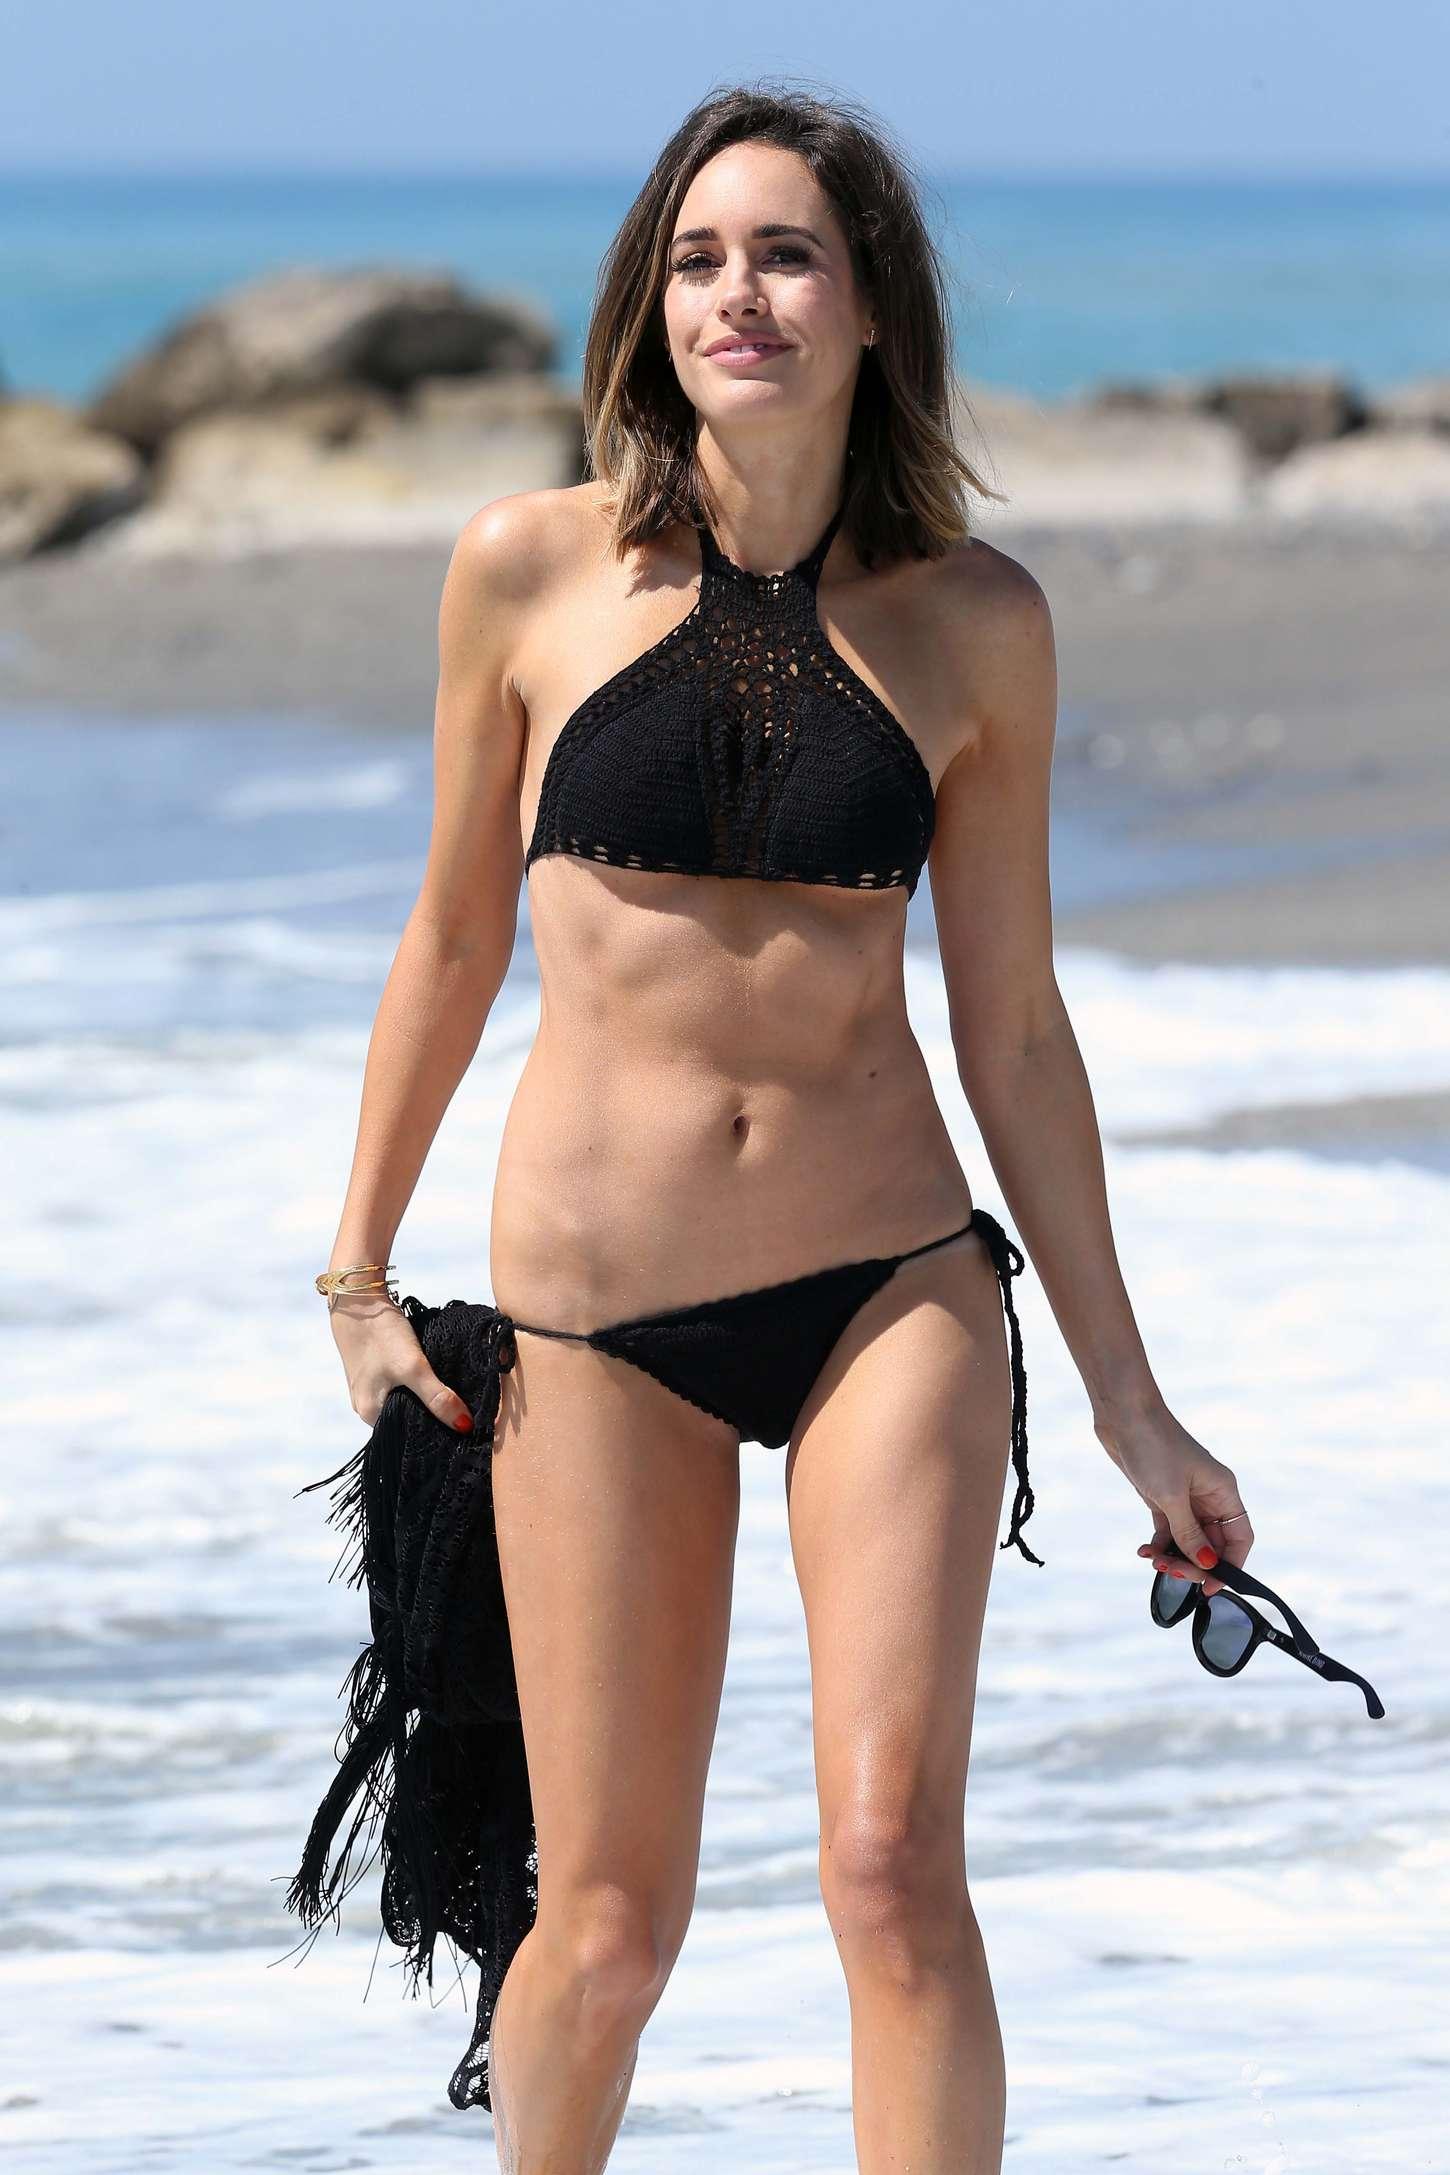 Louise Roe 2015 : Louise Roe in Black Bikini -24